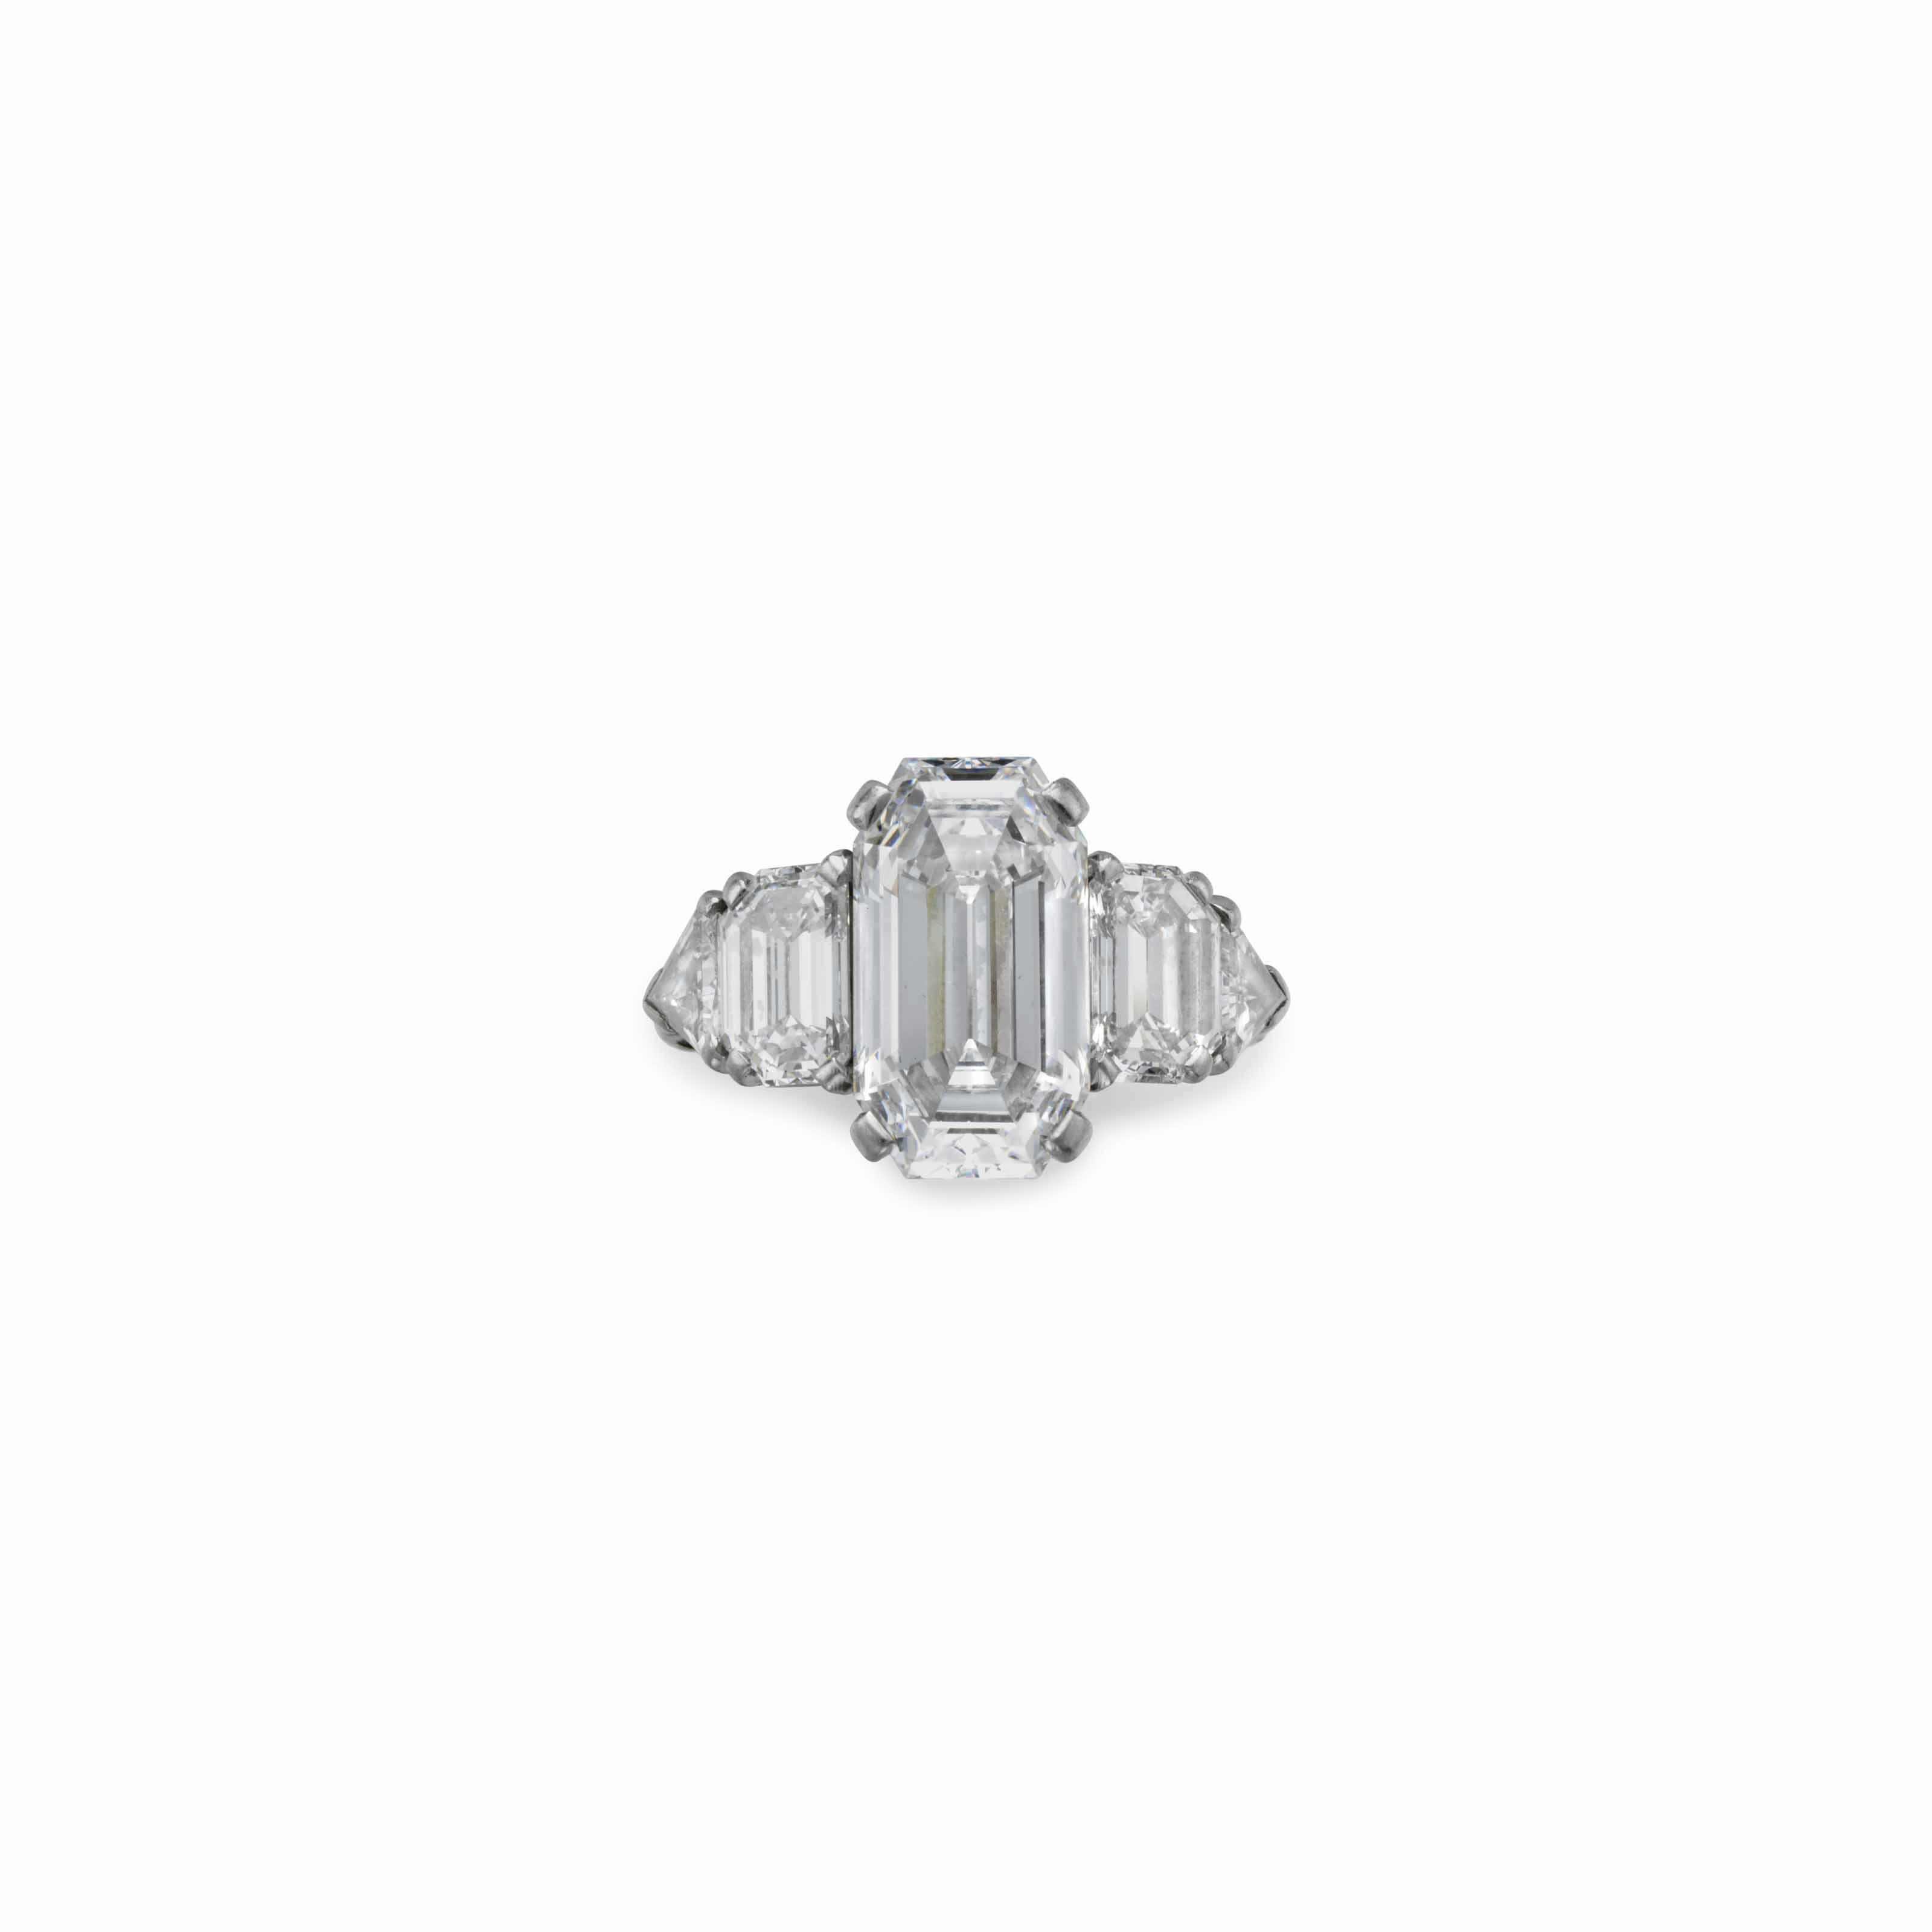 A DIAMOND RING, BY RAYMOND YARD